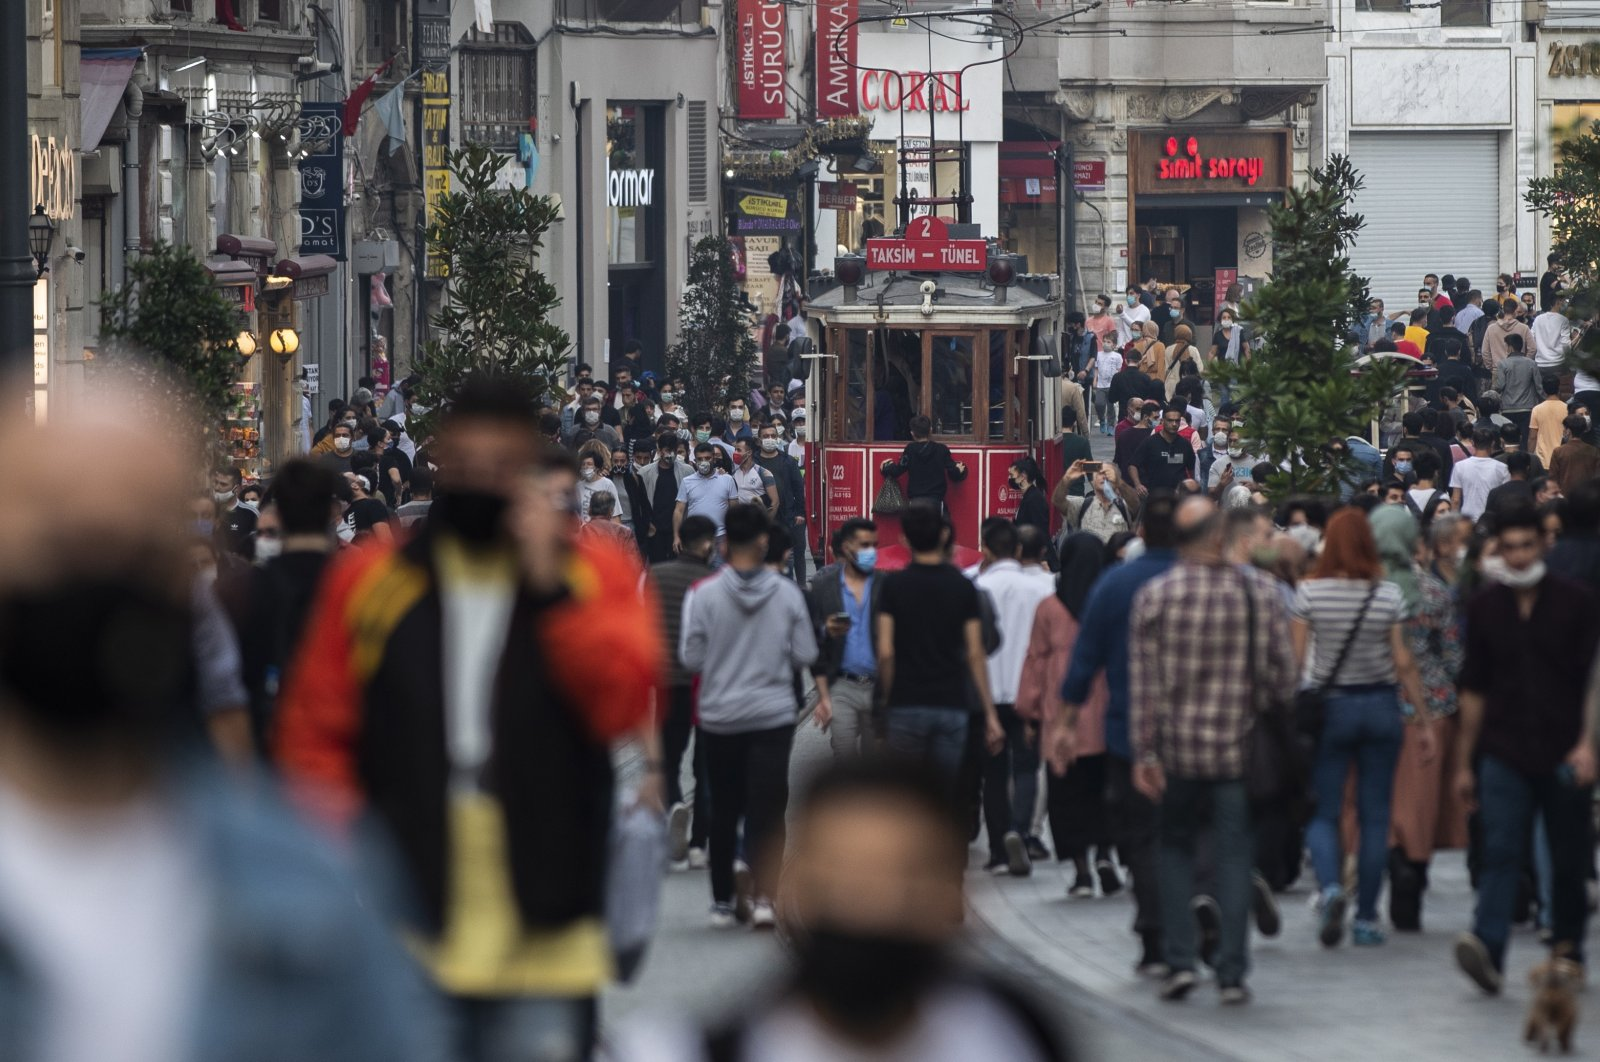 People wearing protective masks walk on Istiklal Street amid the ongoing coronavirus pandemic in Istanbul, Turkey, Oct. 25, 2020. (EPA Photo)